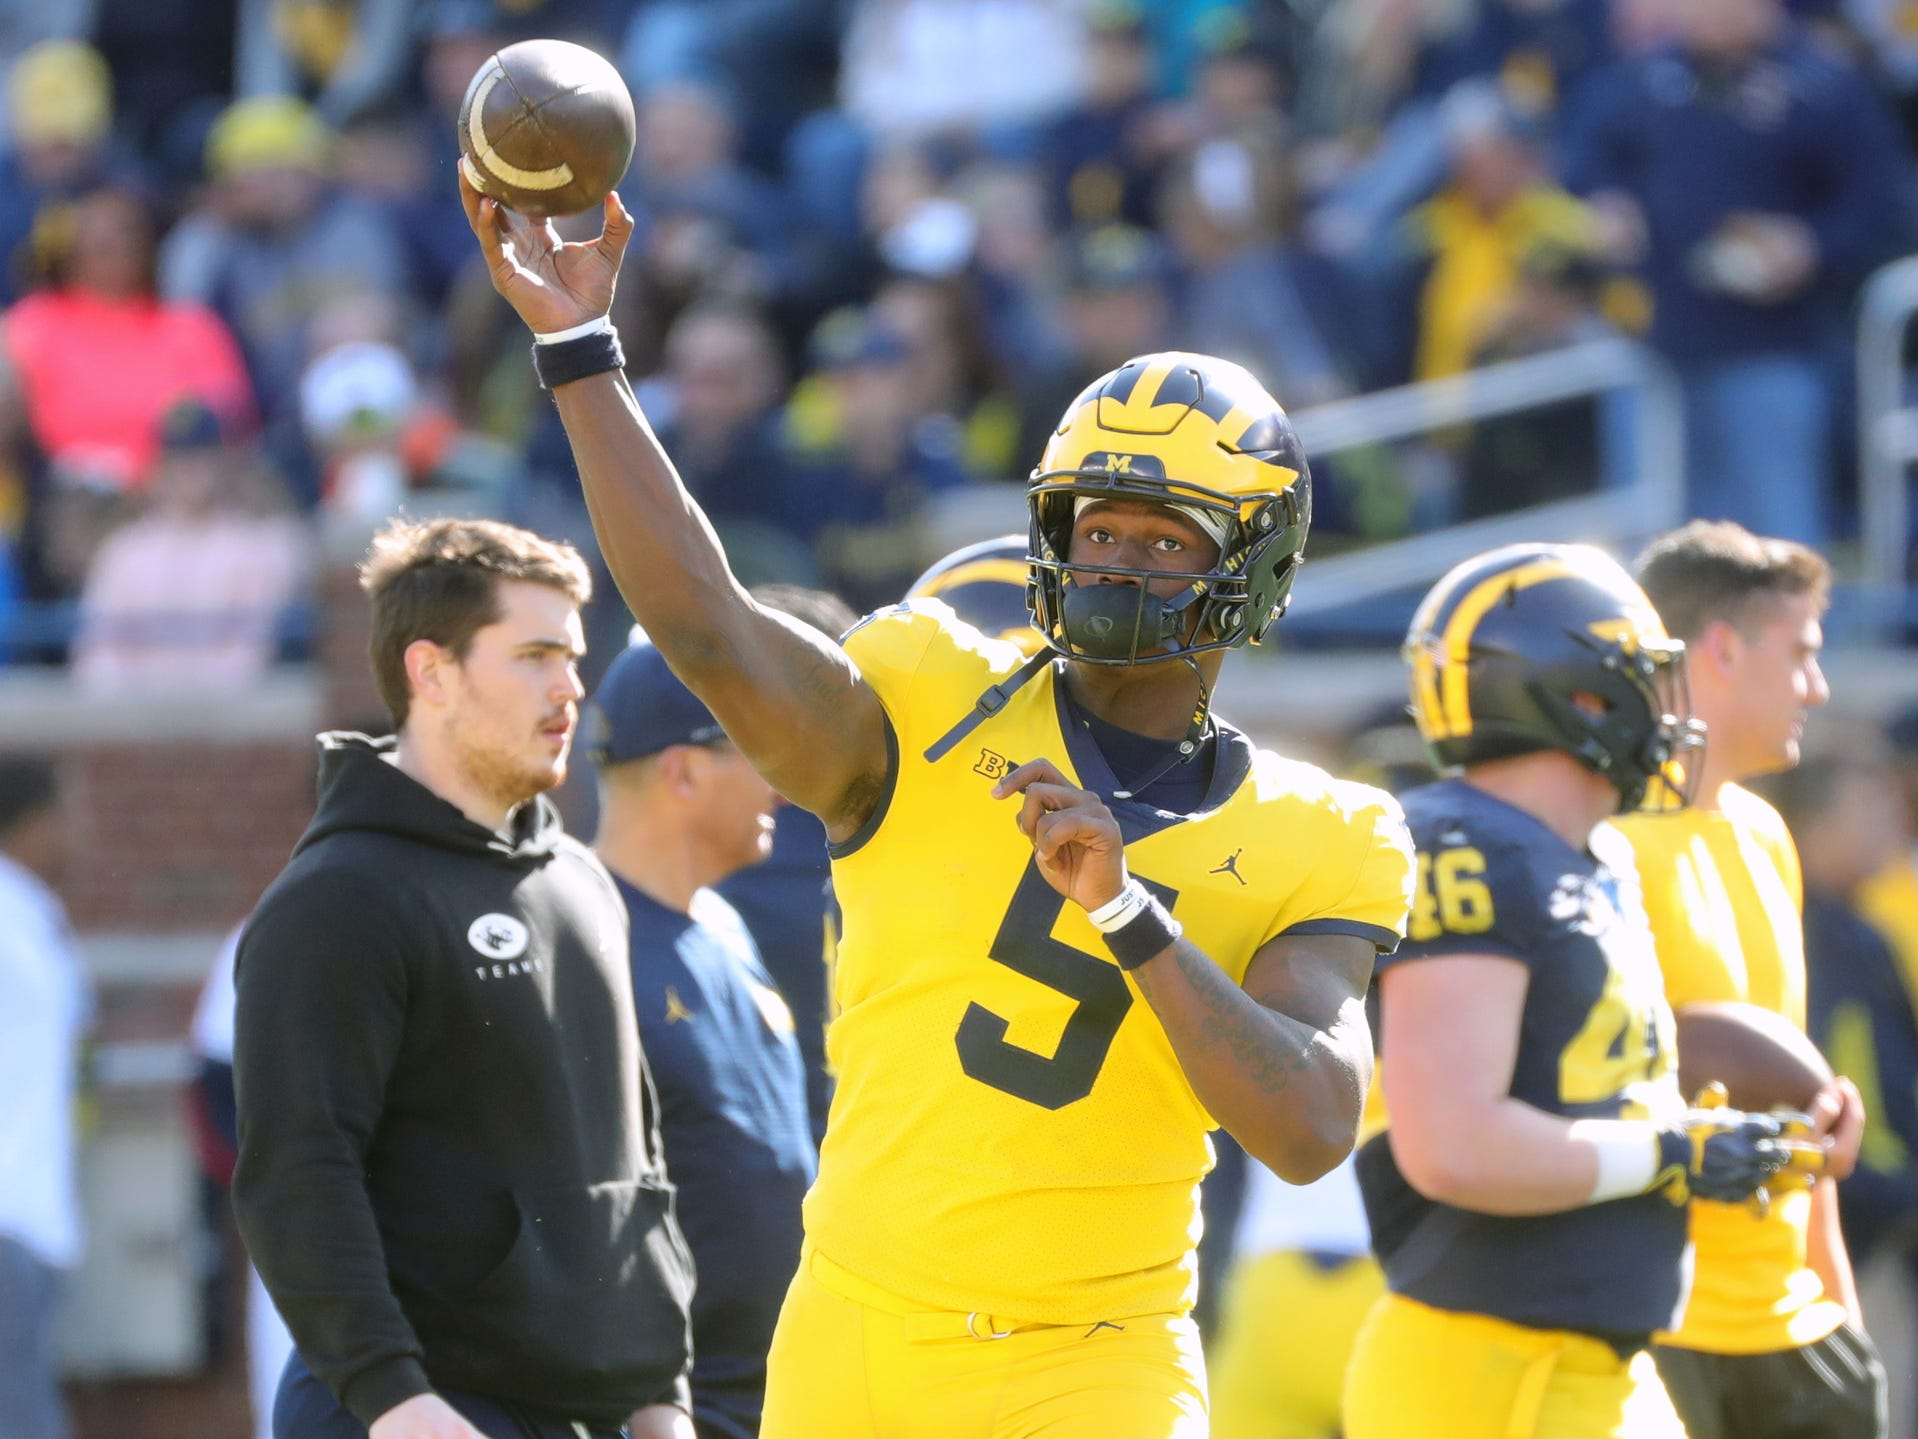 Michigan quarterback Joe Milton passes at the spring game Saturday, April 13, 2019 at Michigan Stadium in Ann Arbor.